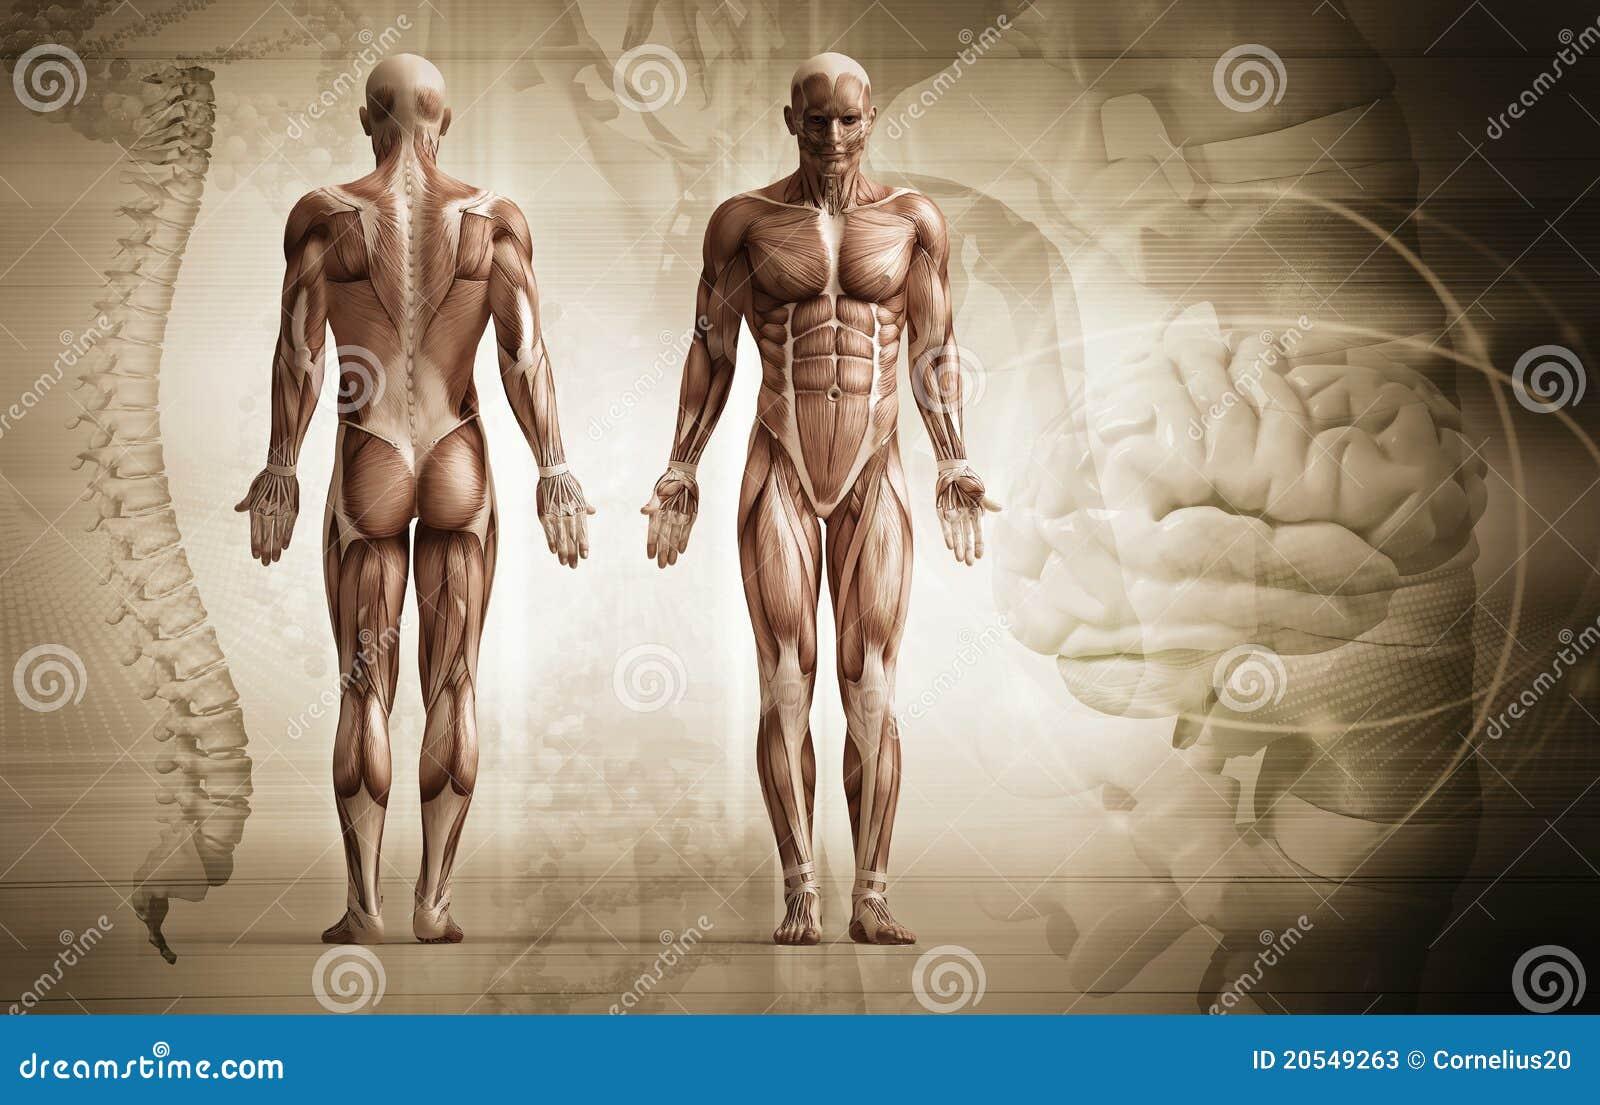 человек тела